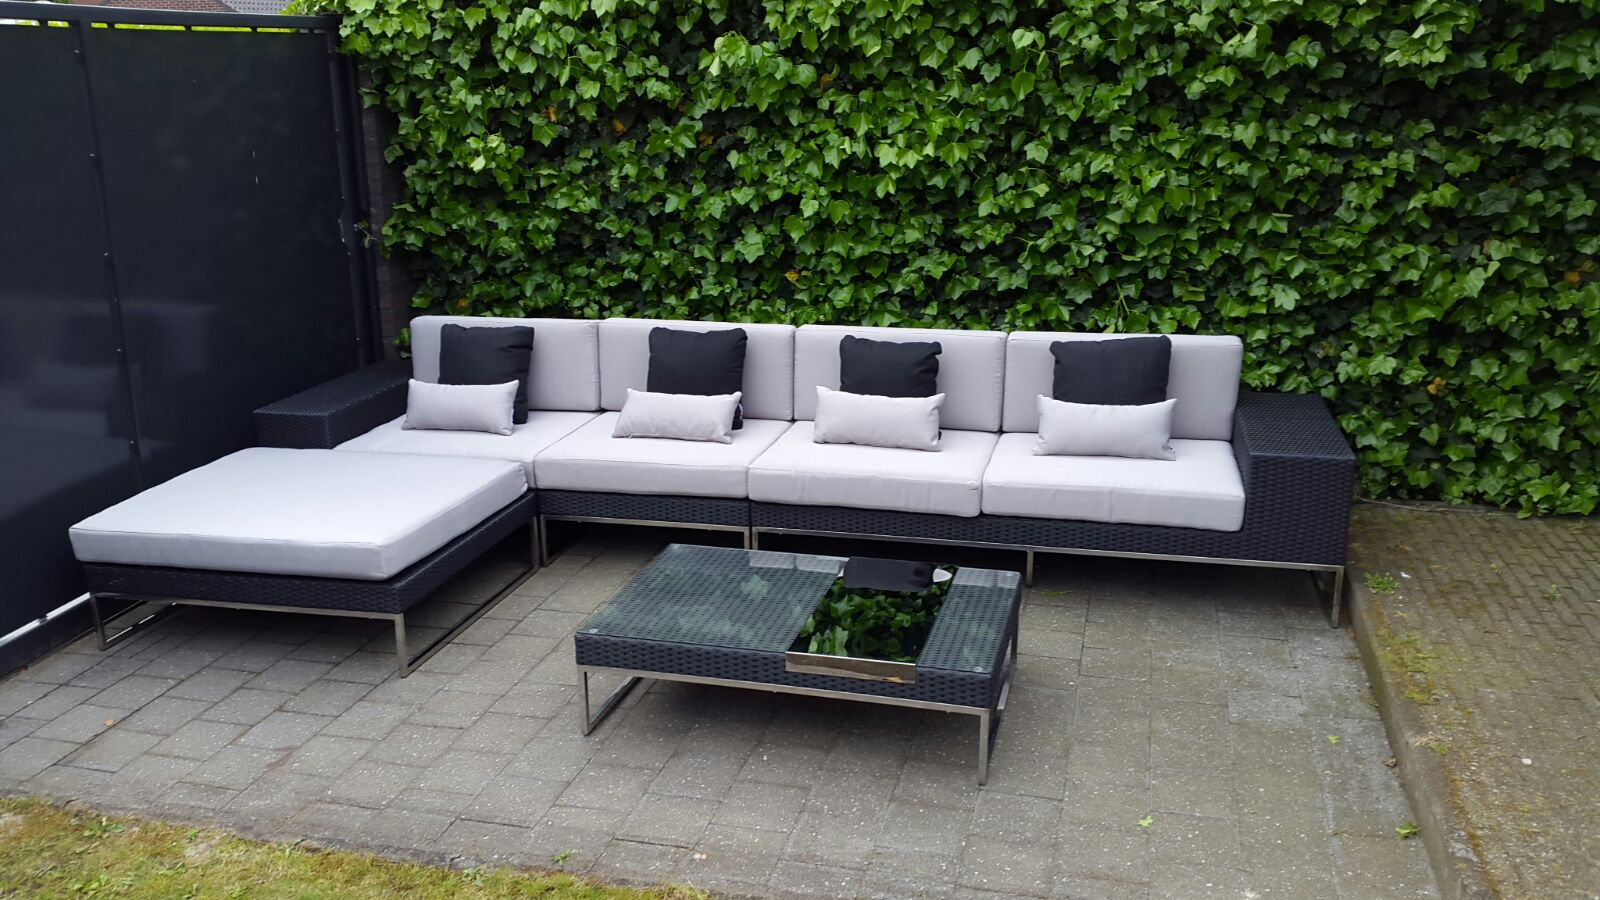 Arbrini design tuinmeubelen - Zwarte bank lounge ...